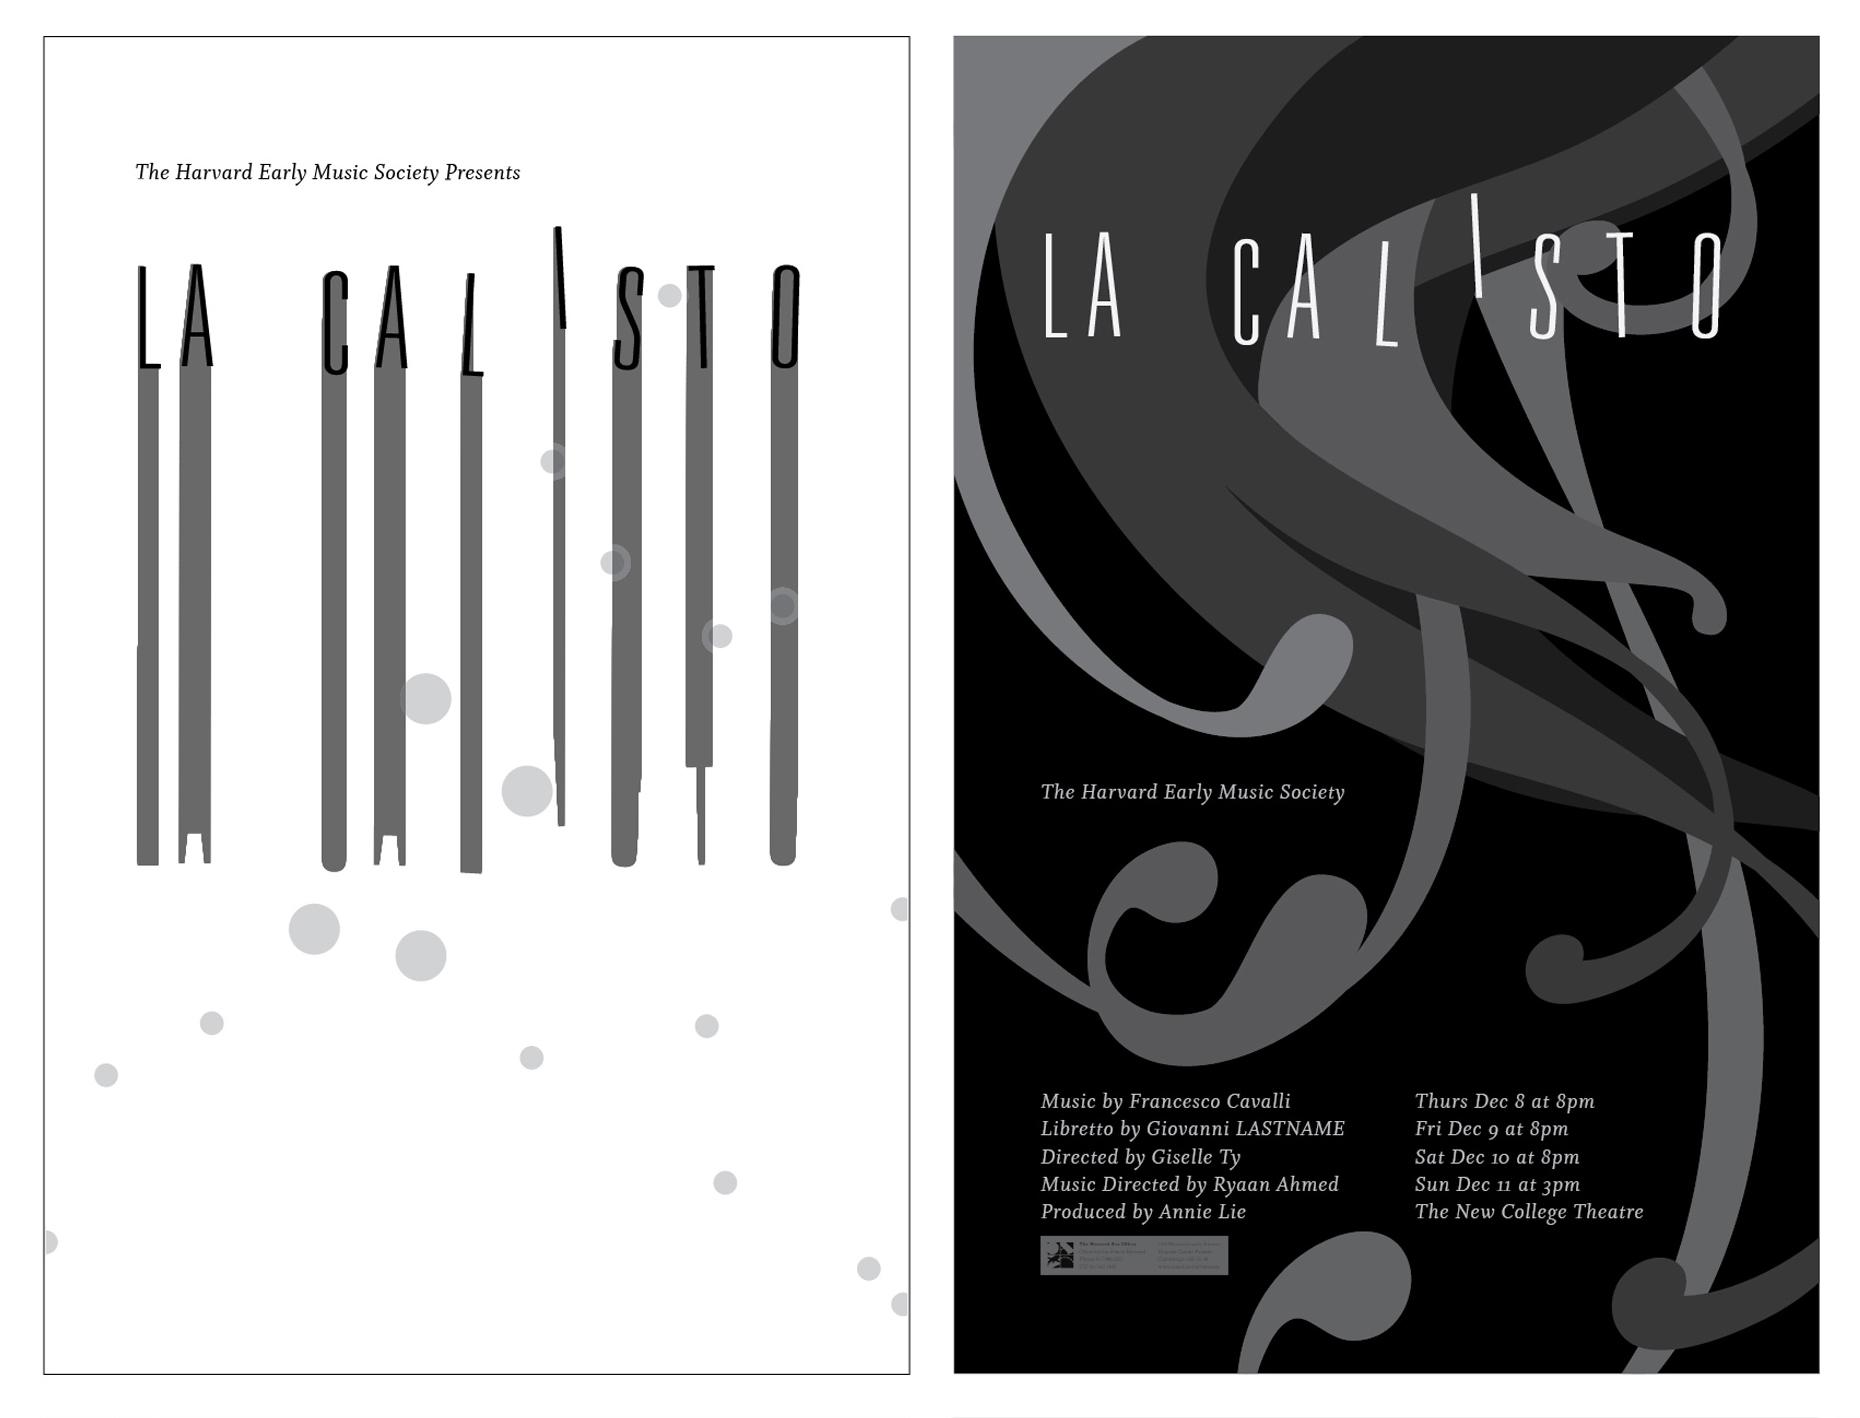 calisto-posters03@2x